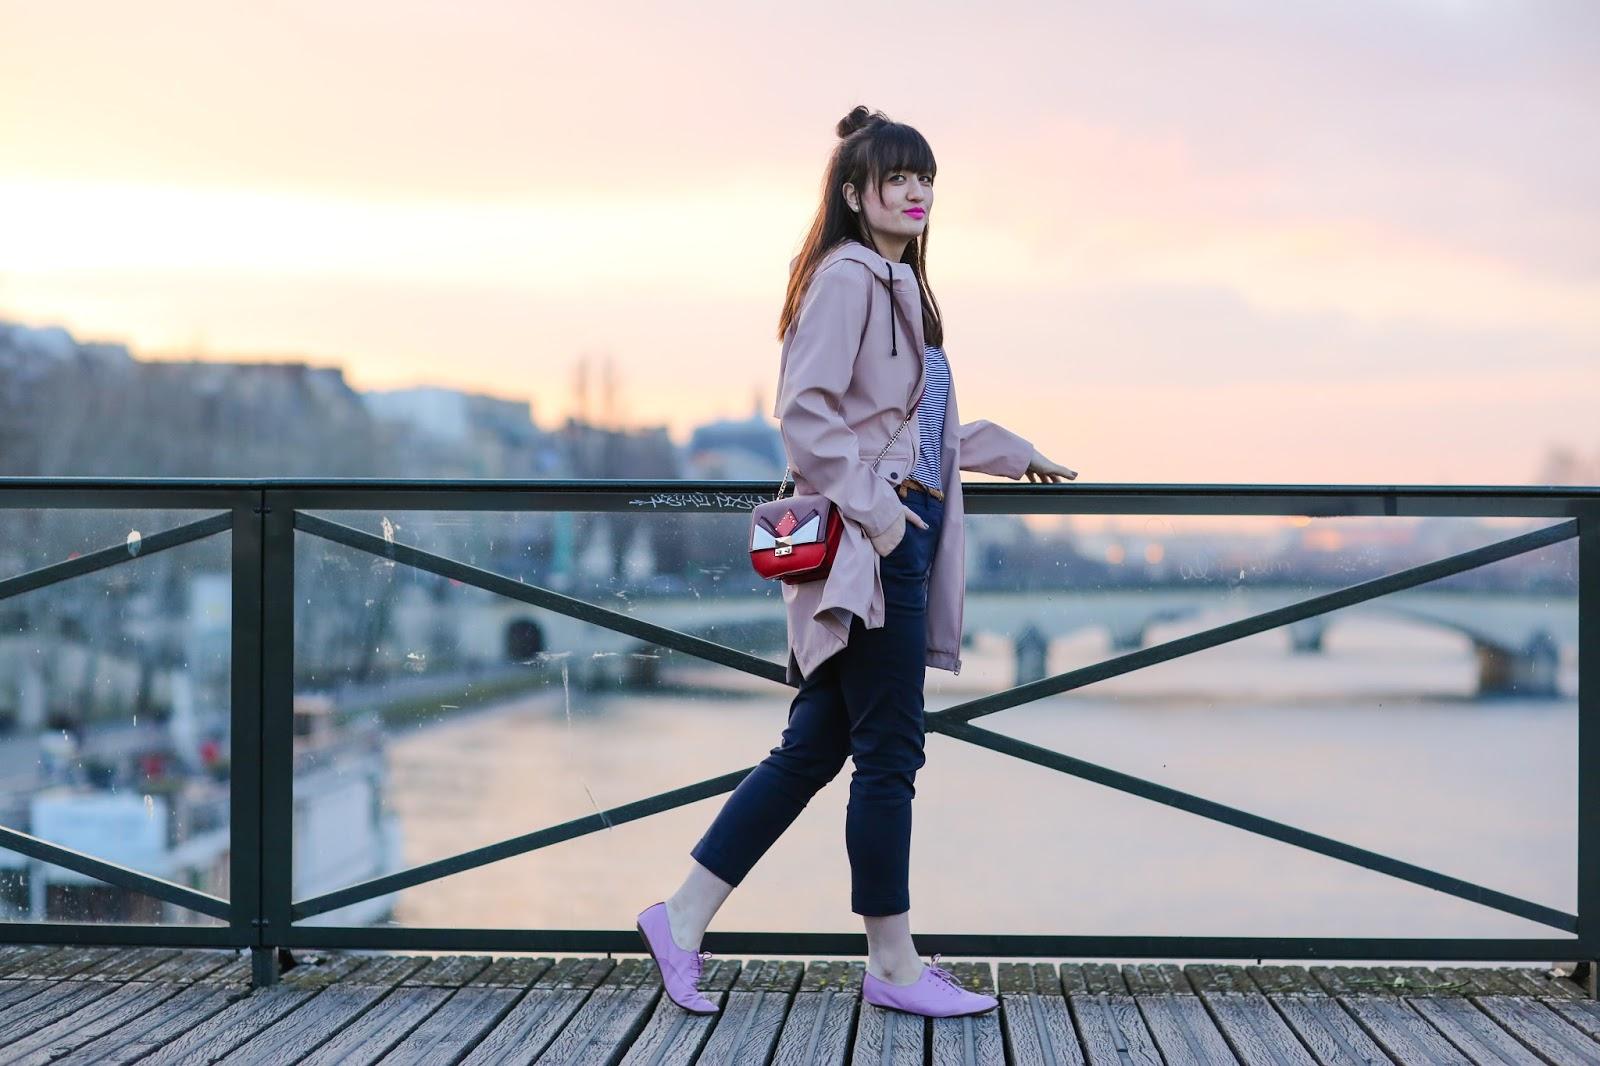 Parisian fashion blogger, fashion photography, meetmeinparee, paris, casual style, street style